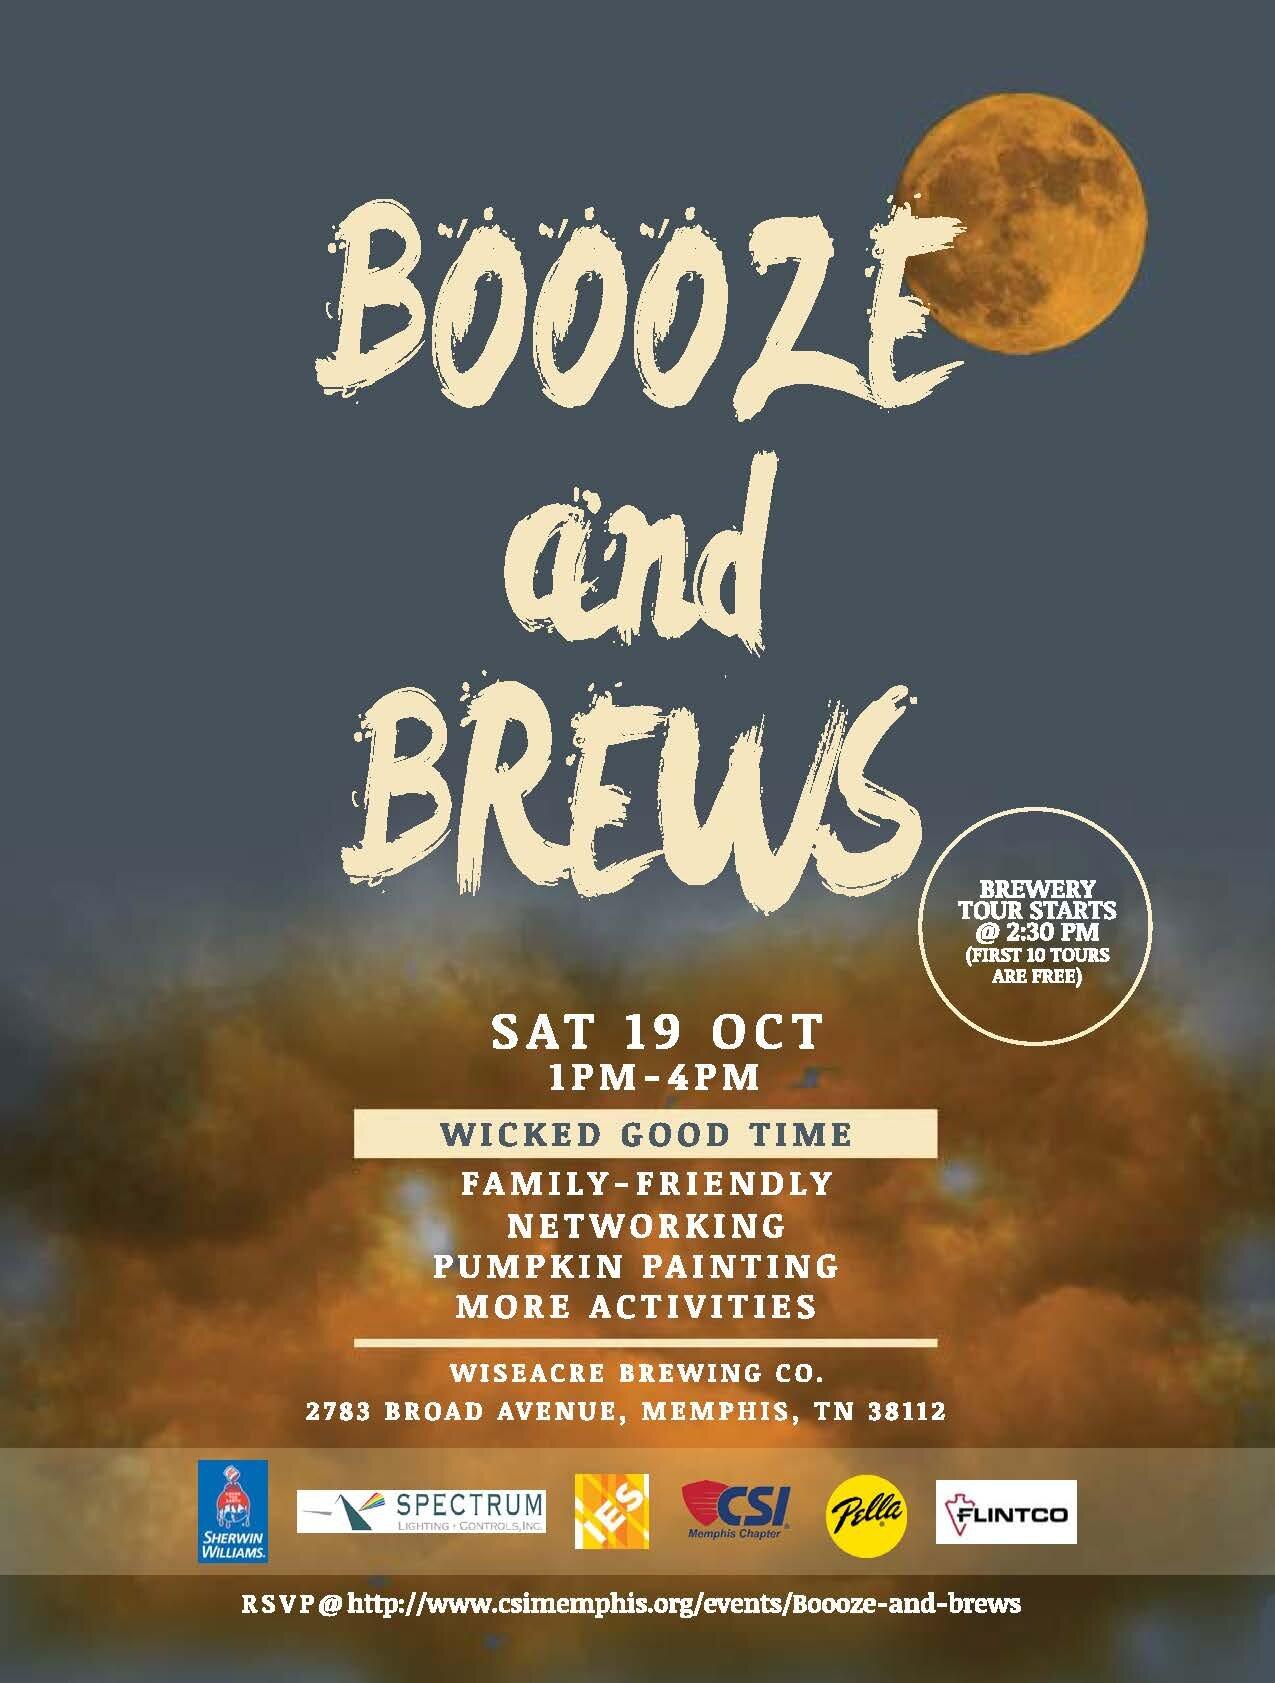 Boooze and Brews - Final.jpg